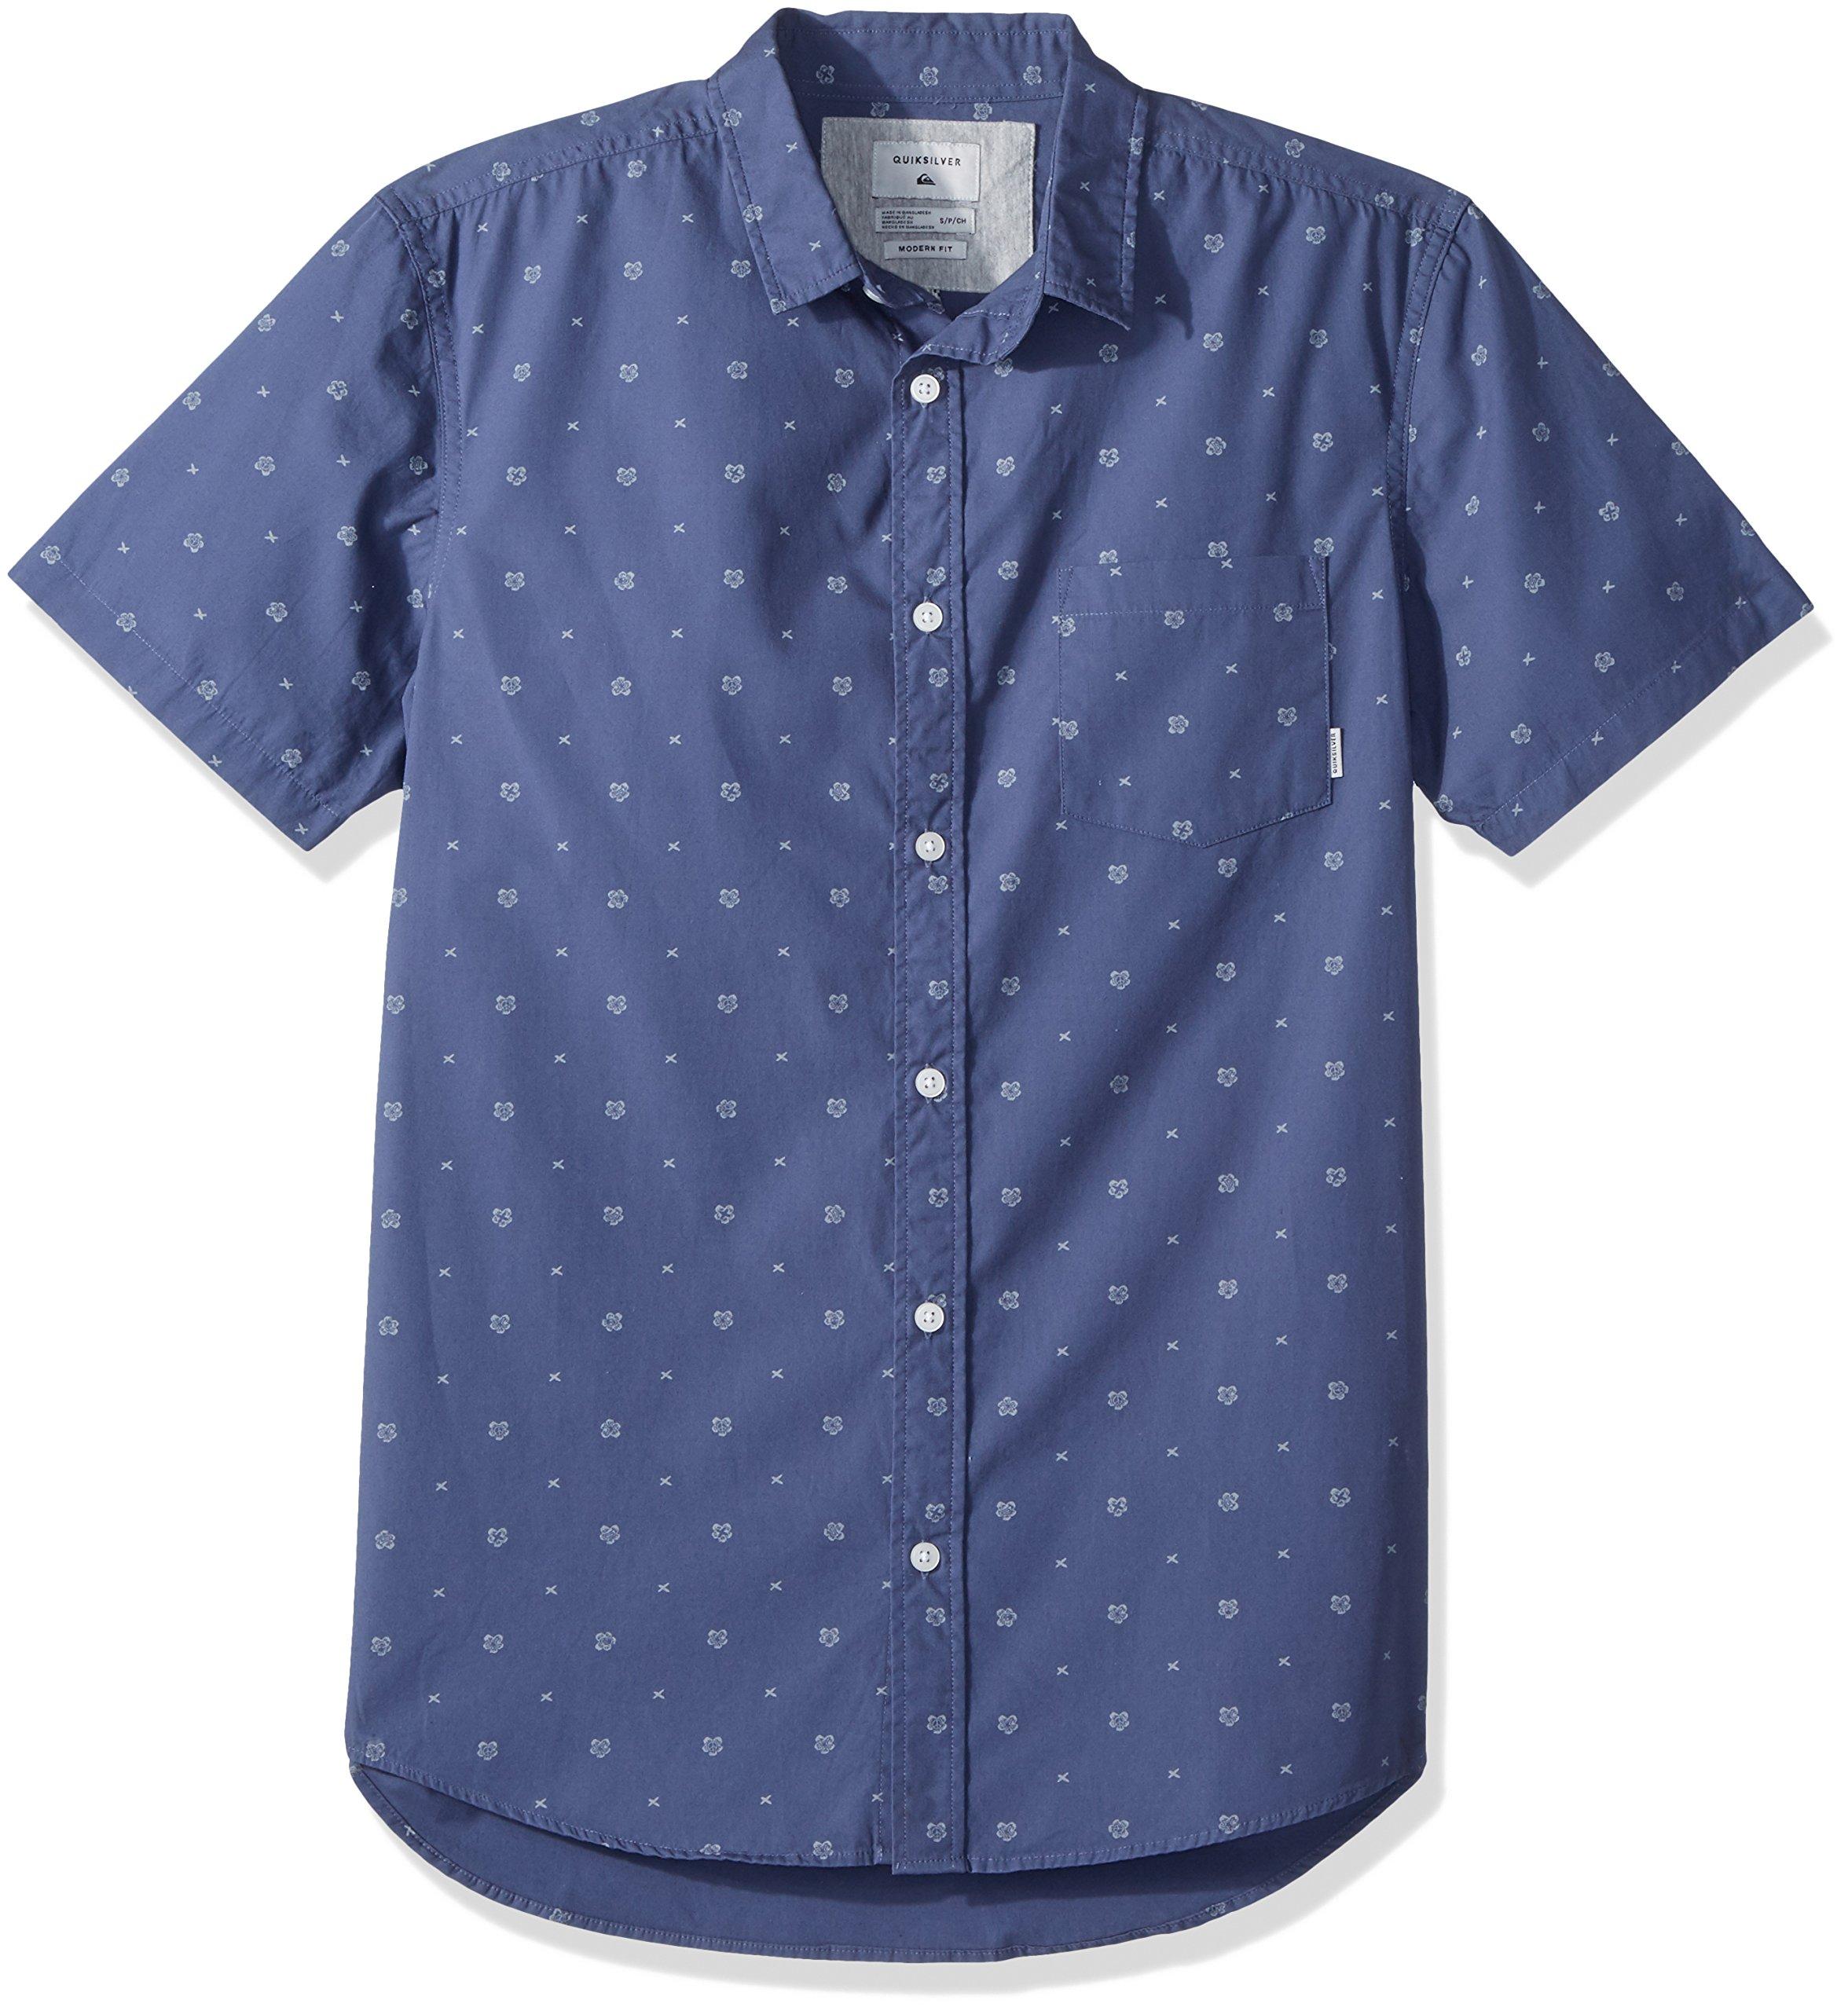 Quiksilver Men's Kamanoa Short Sleeve, Vintage Indigo Kamanoa, XXL